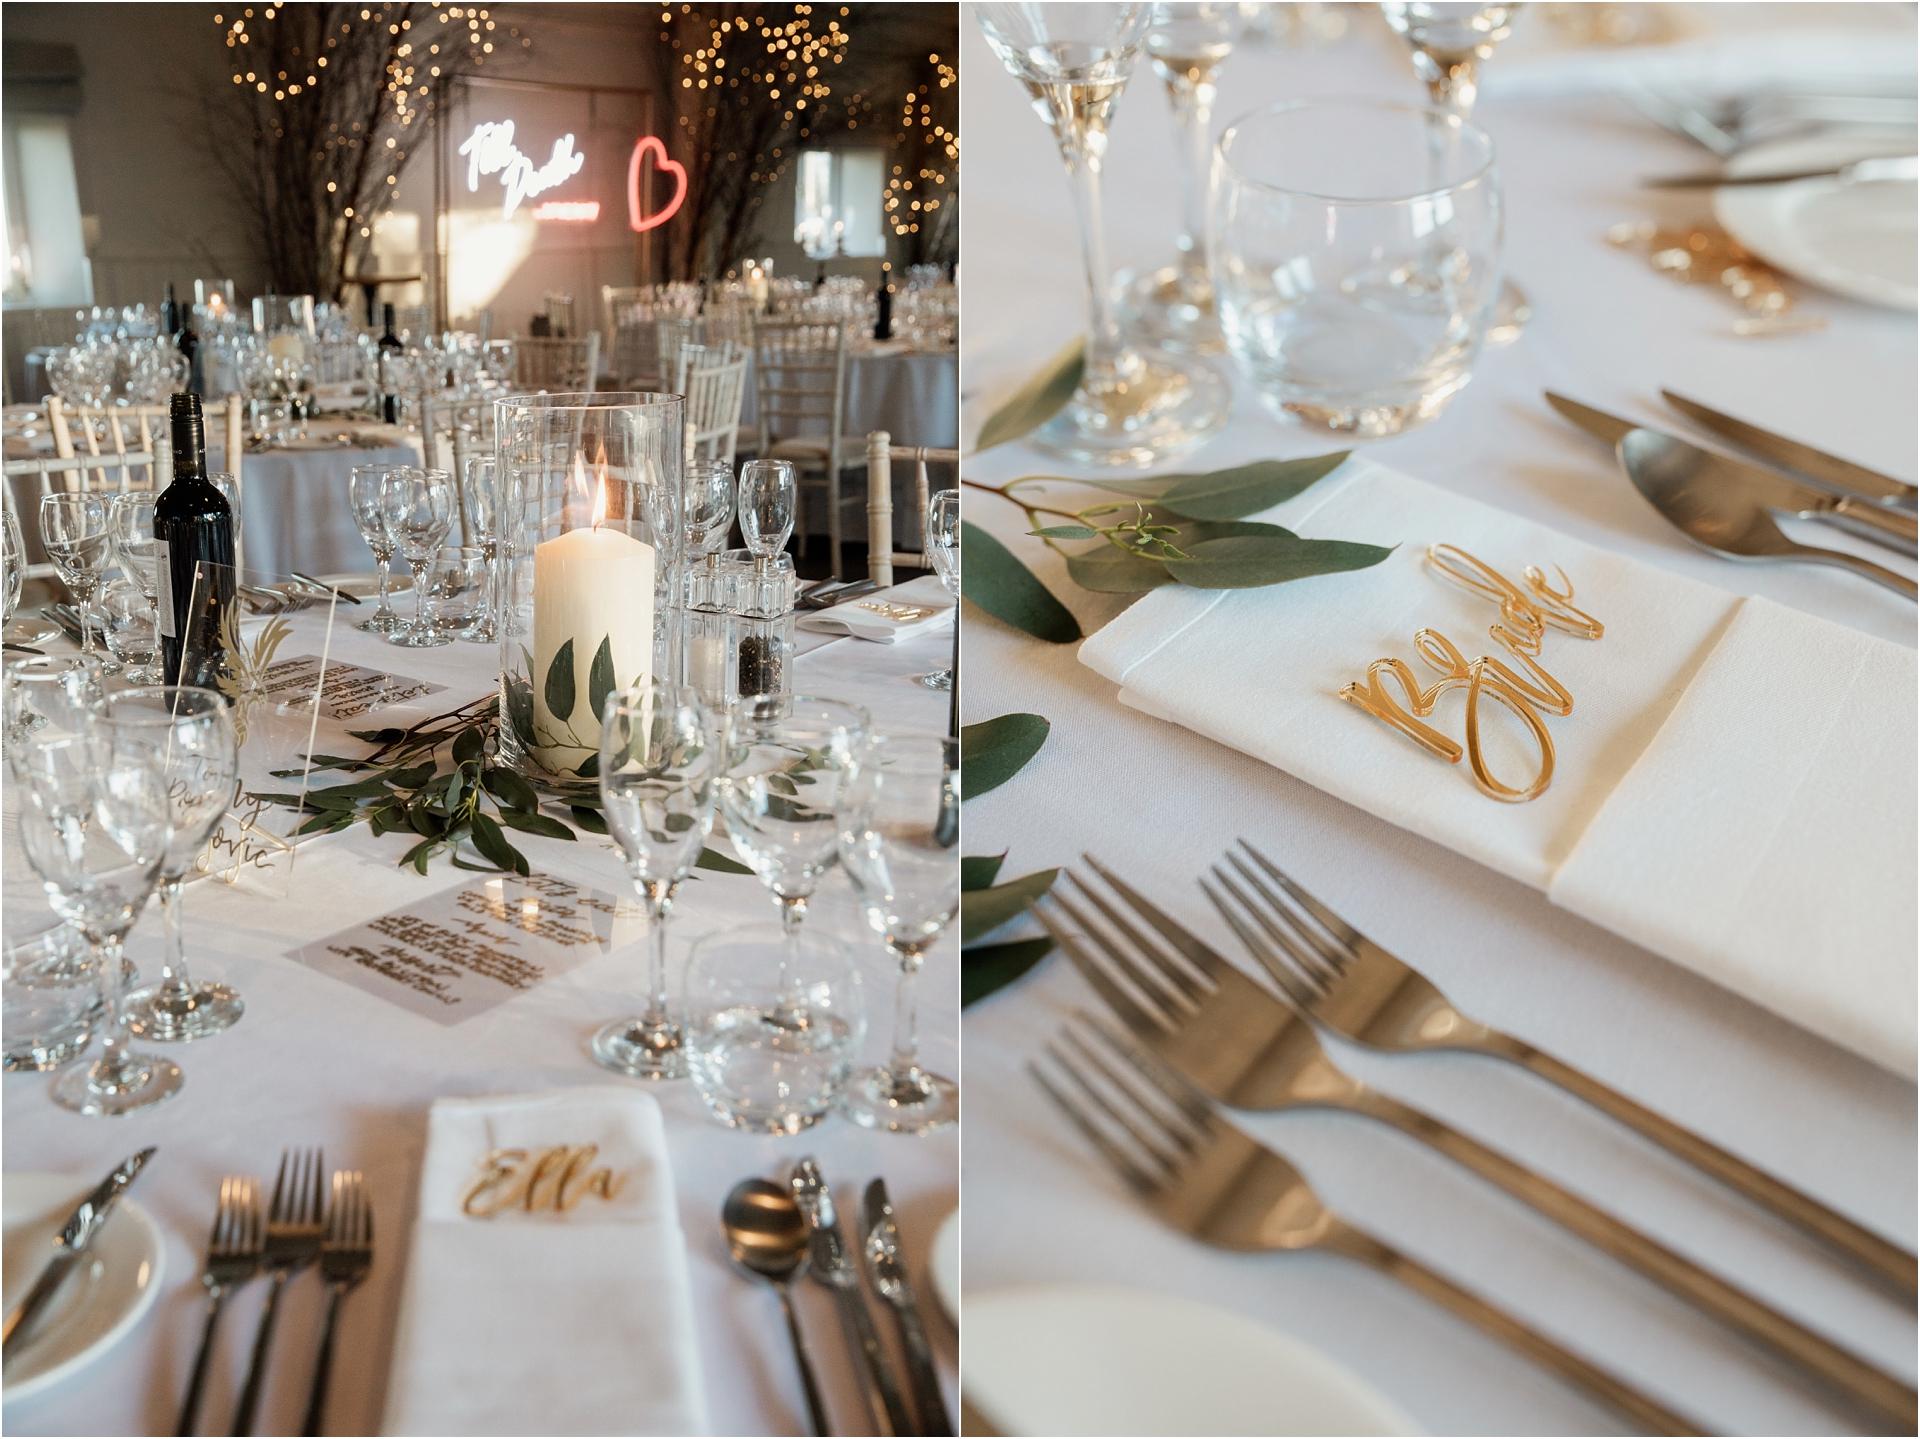 Lapstone Barn winter wedding style